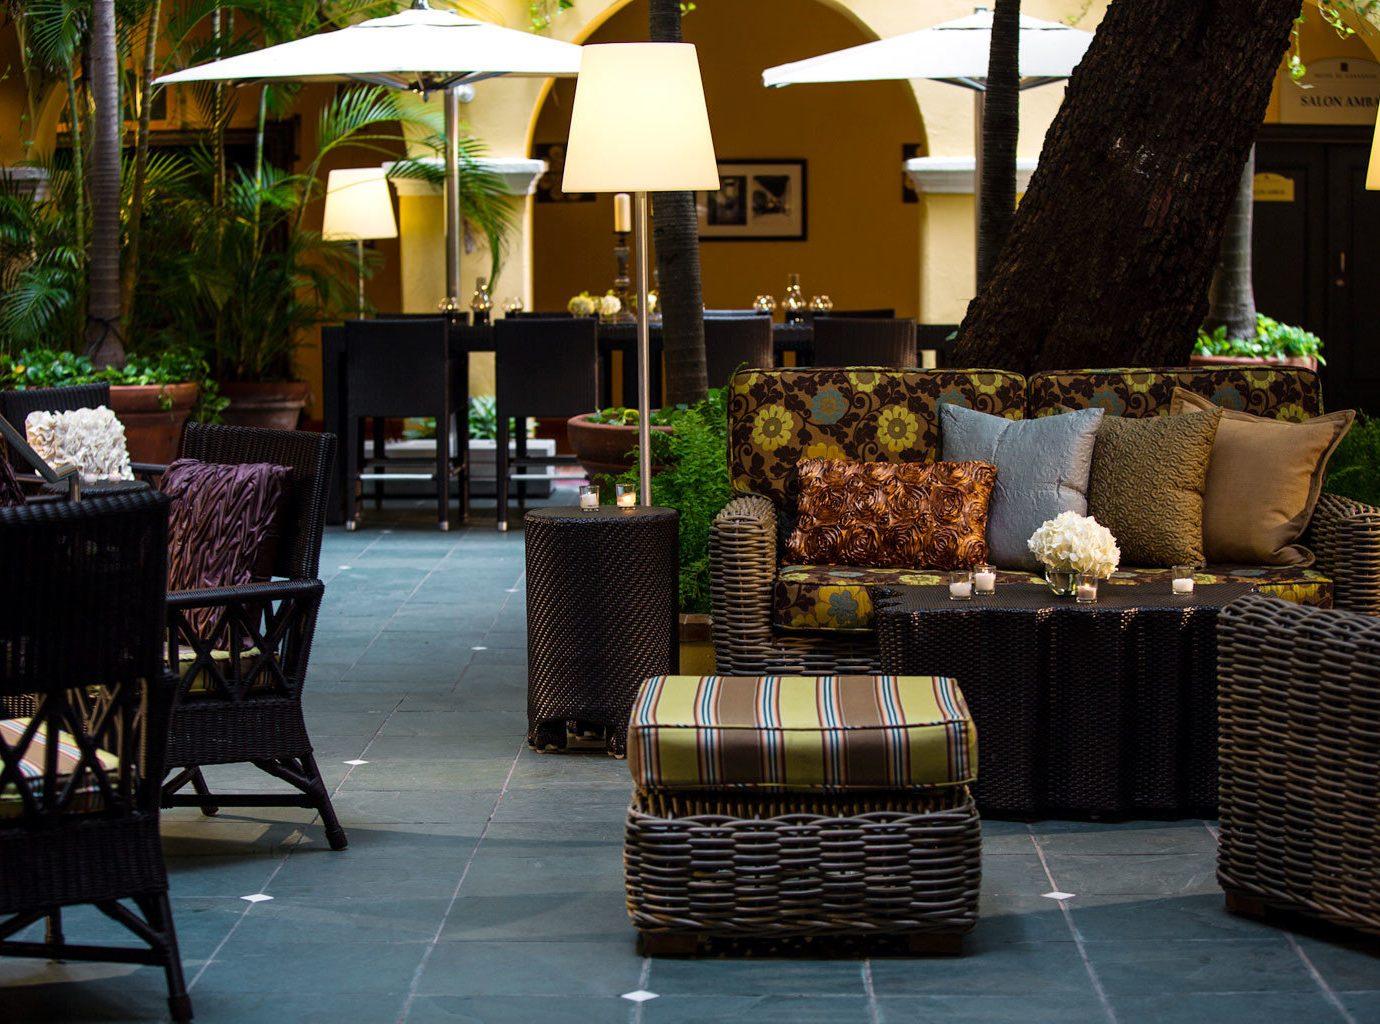 Elegant Hip Hotels Living Lounge Luxury table chair room restaurant interior design Design estate Lobby outdoor structure furniture backyard area set arranged